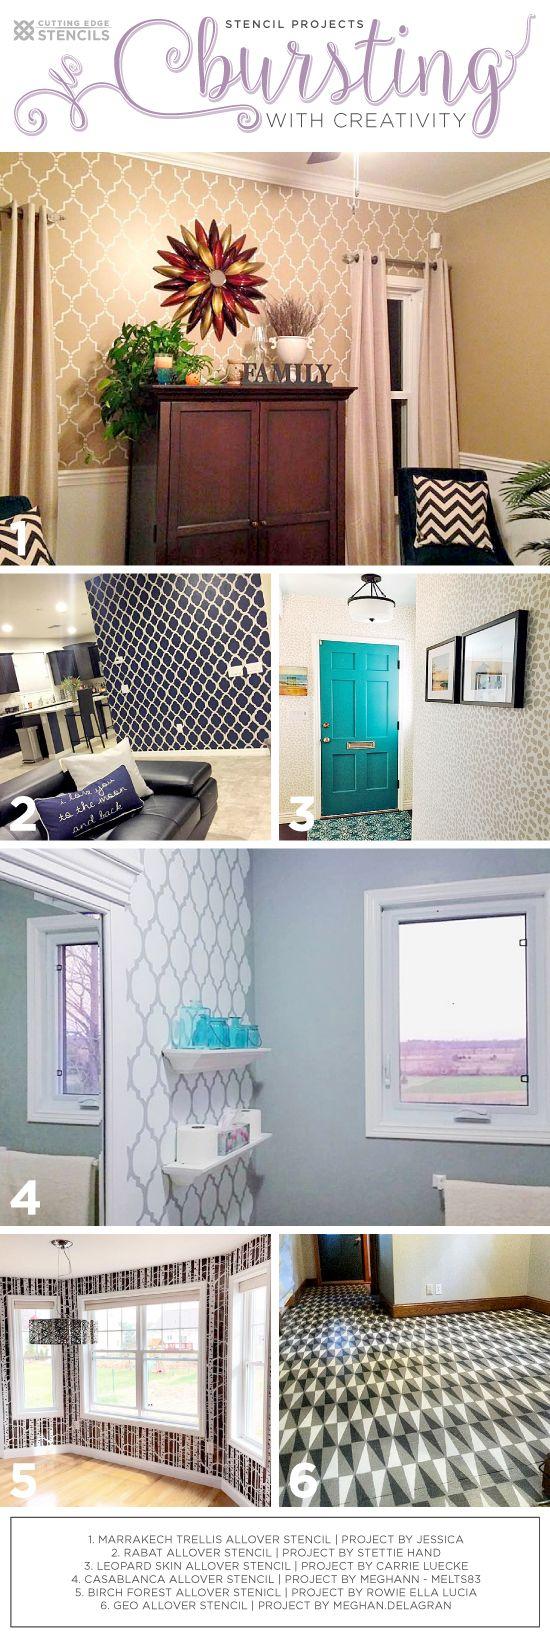 Cutting Edge Stencils shares DIY stenciled room ideas using wall stencils. http://www.cuttingedgestencils.com/wall-stencils-stencil-designs.html?utm_source=JCG&utm_medium=Pinterest%20Comment&utm_campaign=New%20Stencil%20Designs